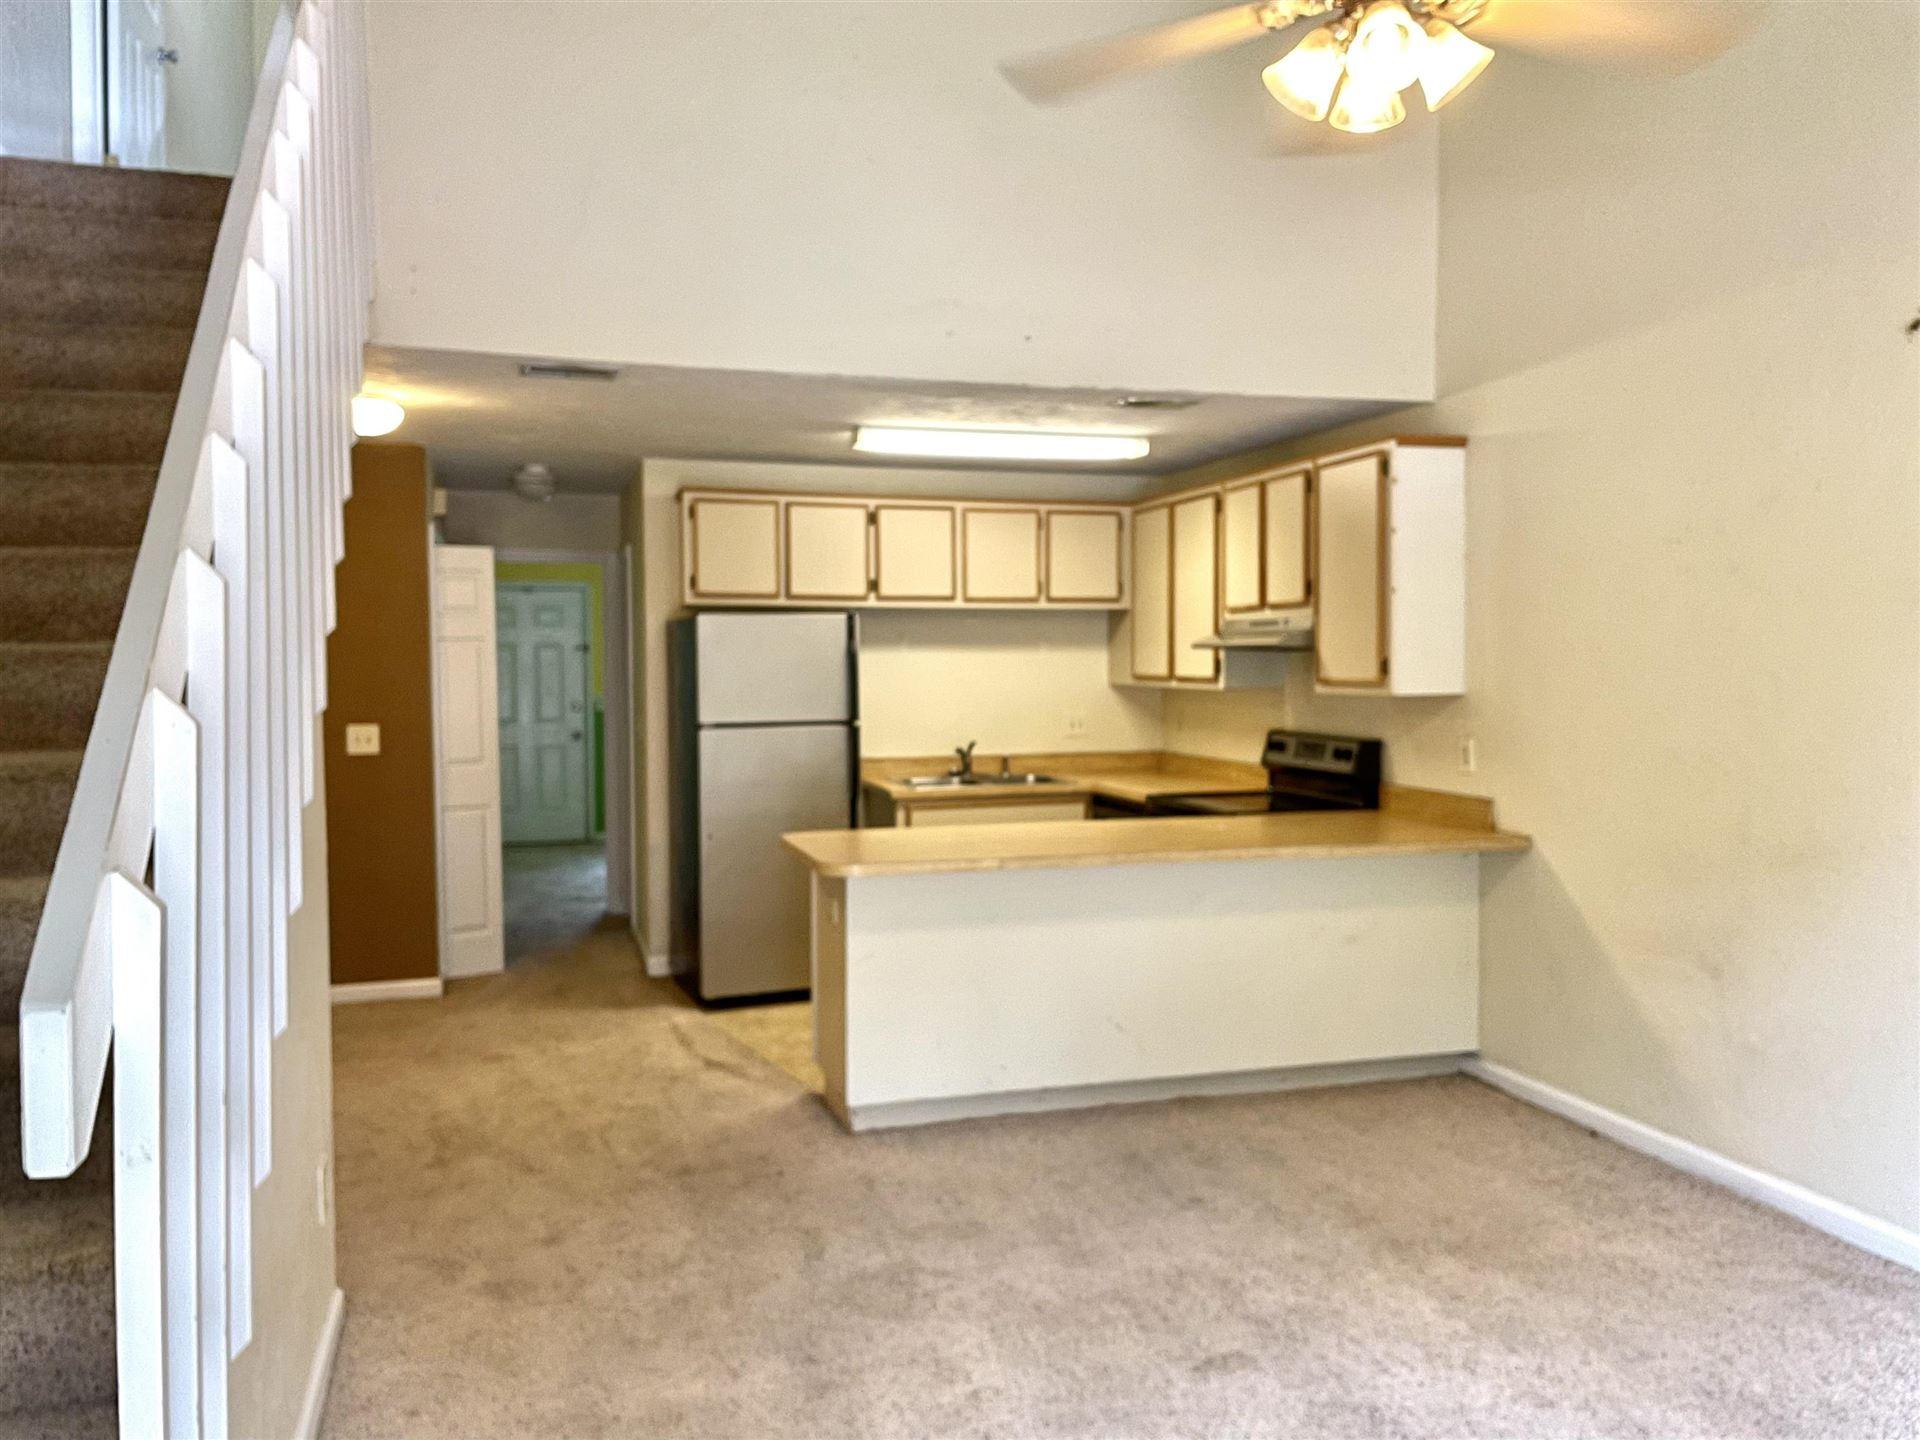 Photo of 2323 Hartsfield Way, TALLAHASSEE, FL 32303 (MLS # 337433)